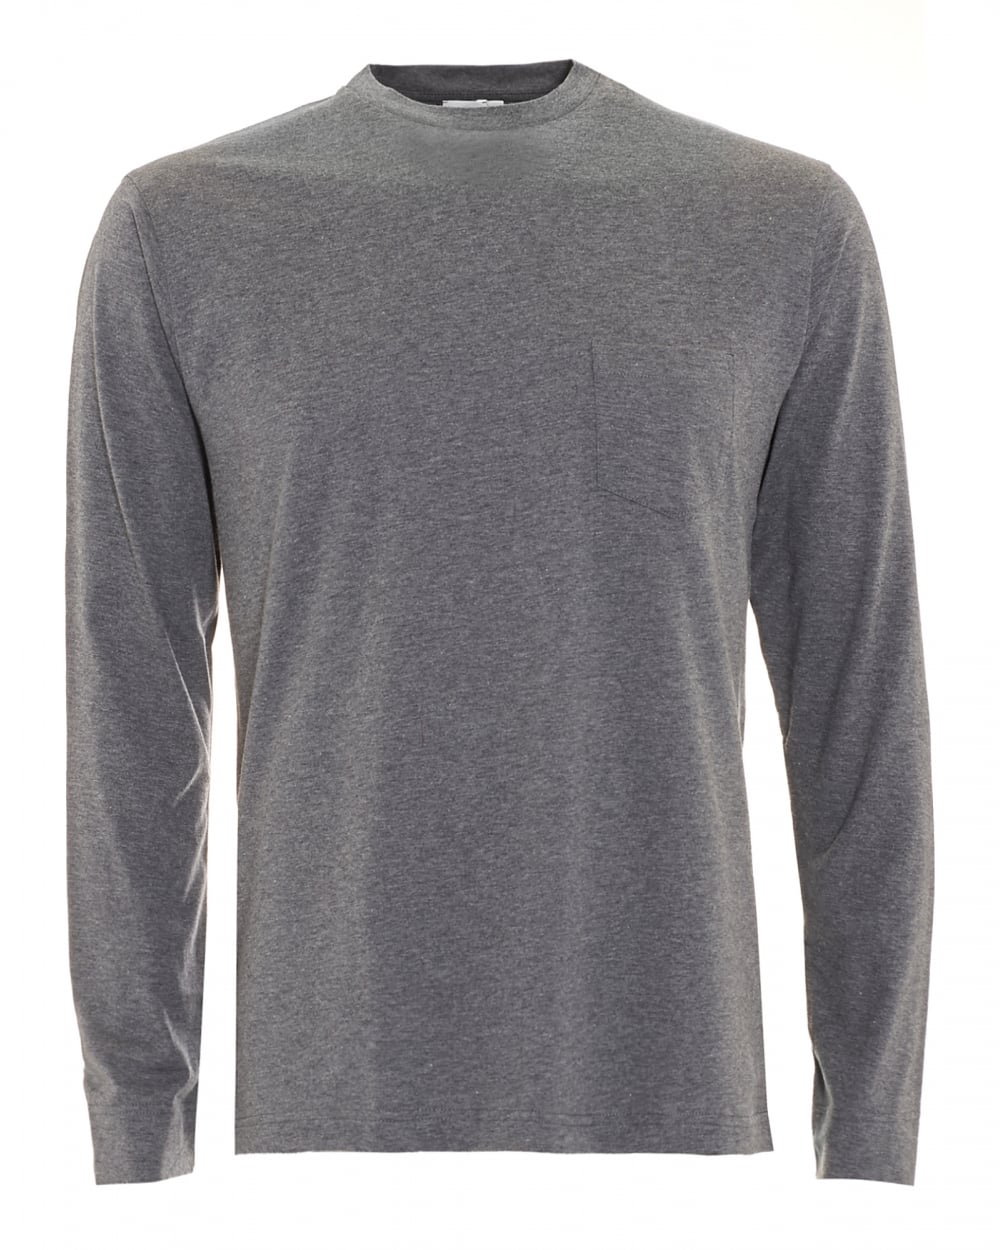 sunspel mens long sleeve charcoal grey t shirt